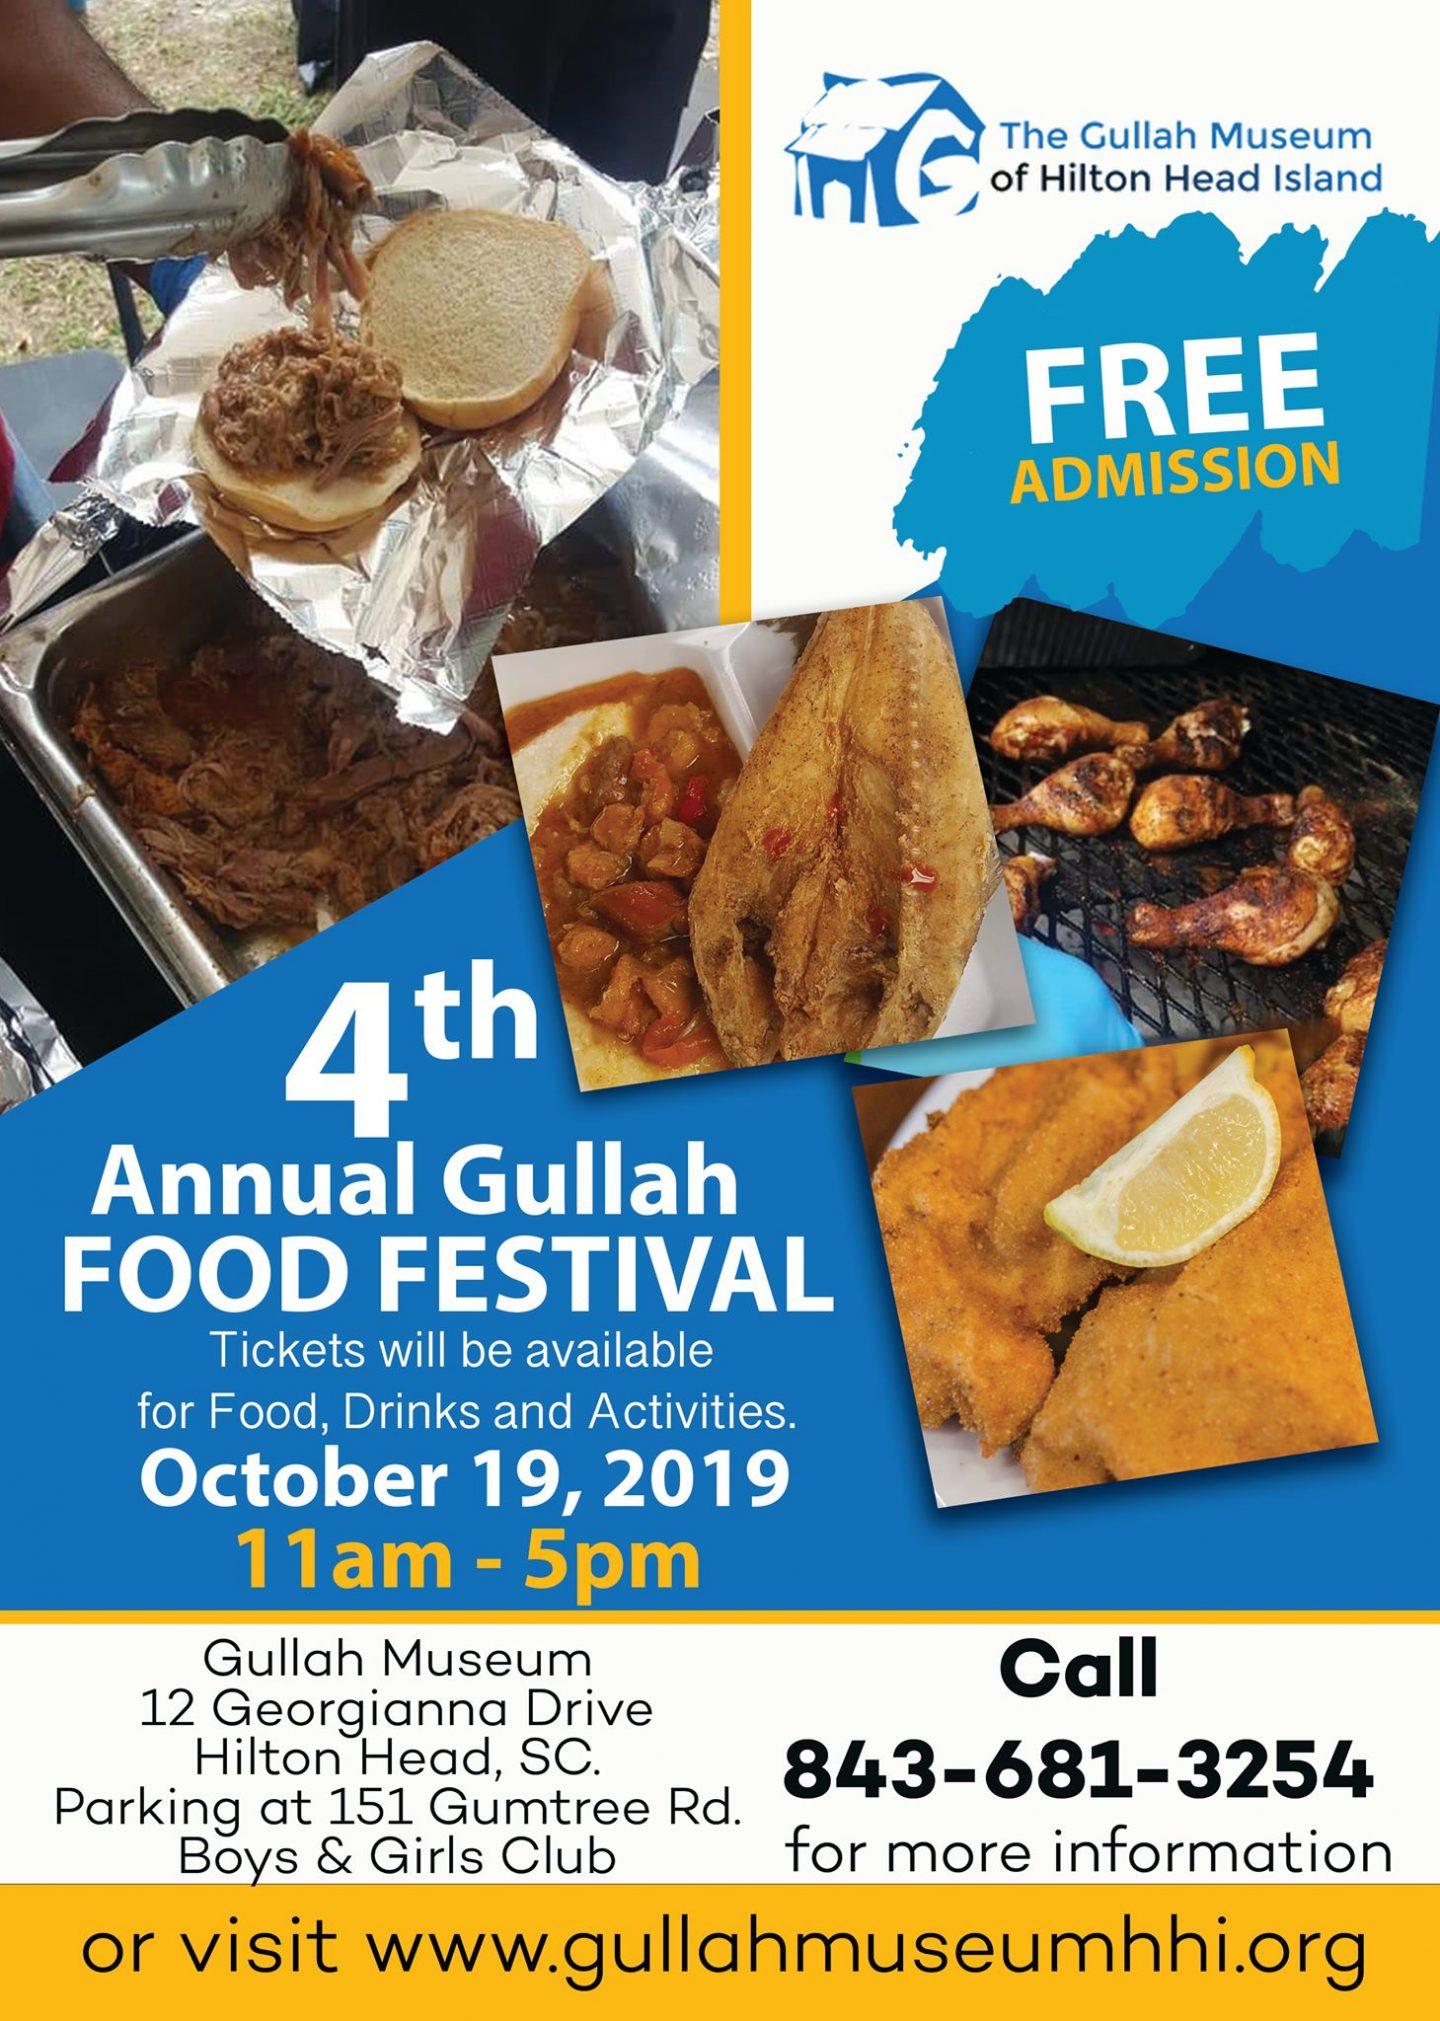 Gullah Food Festival in Hilton Head Island, SC